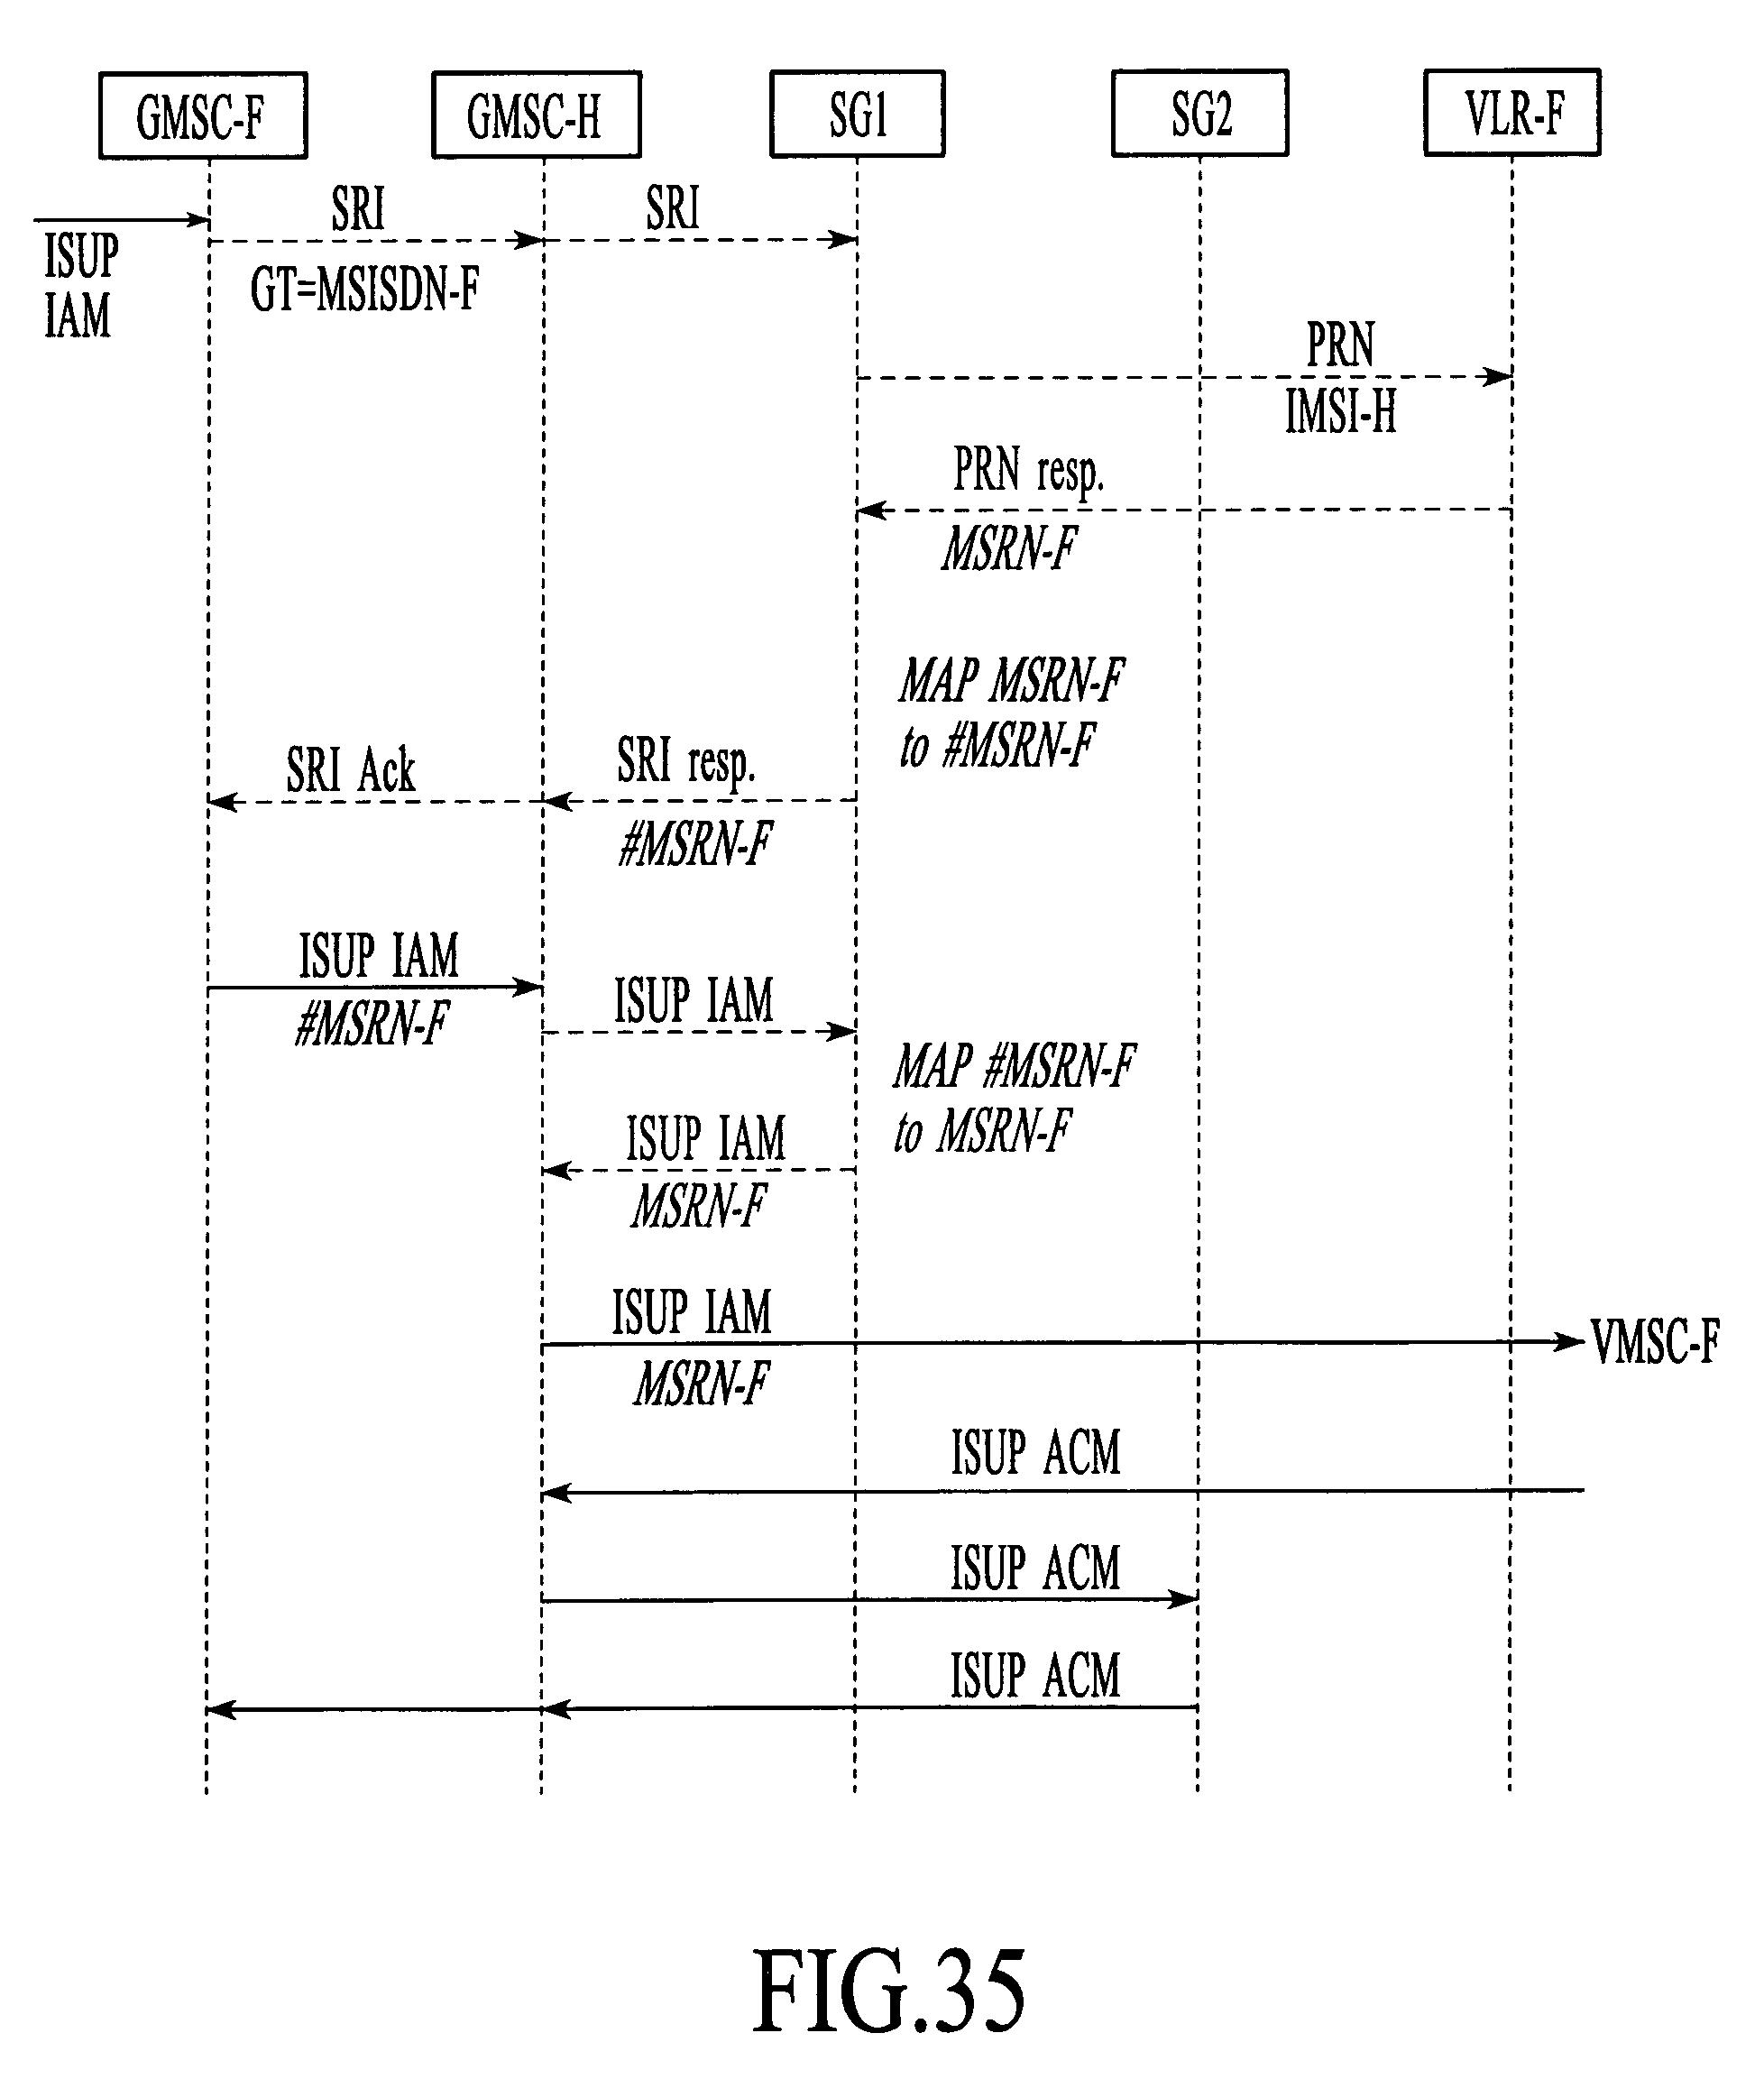 Patent US 7,577,431 B2